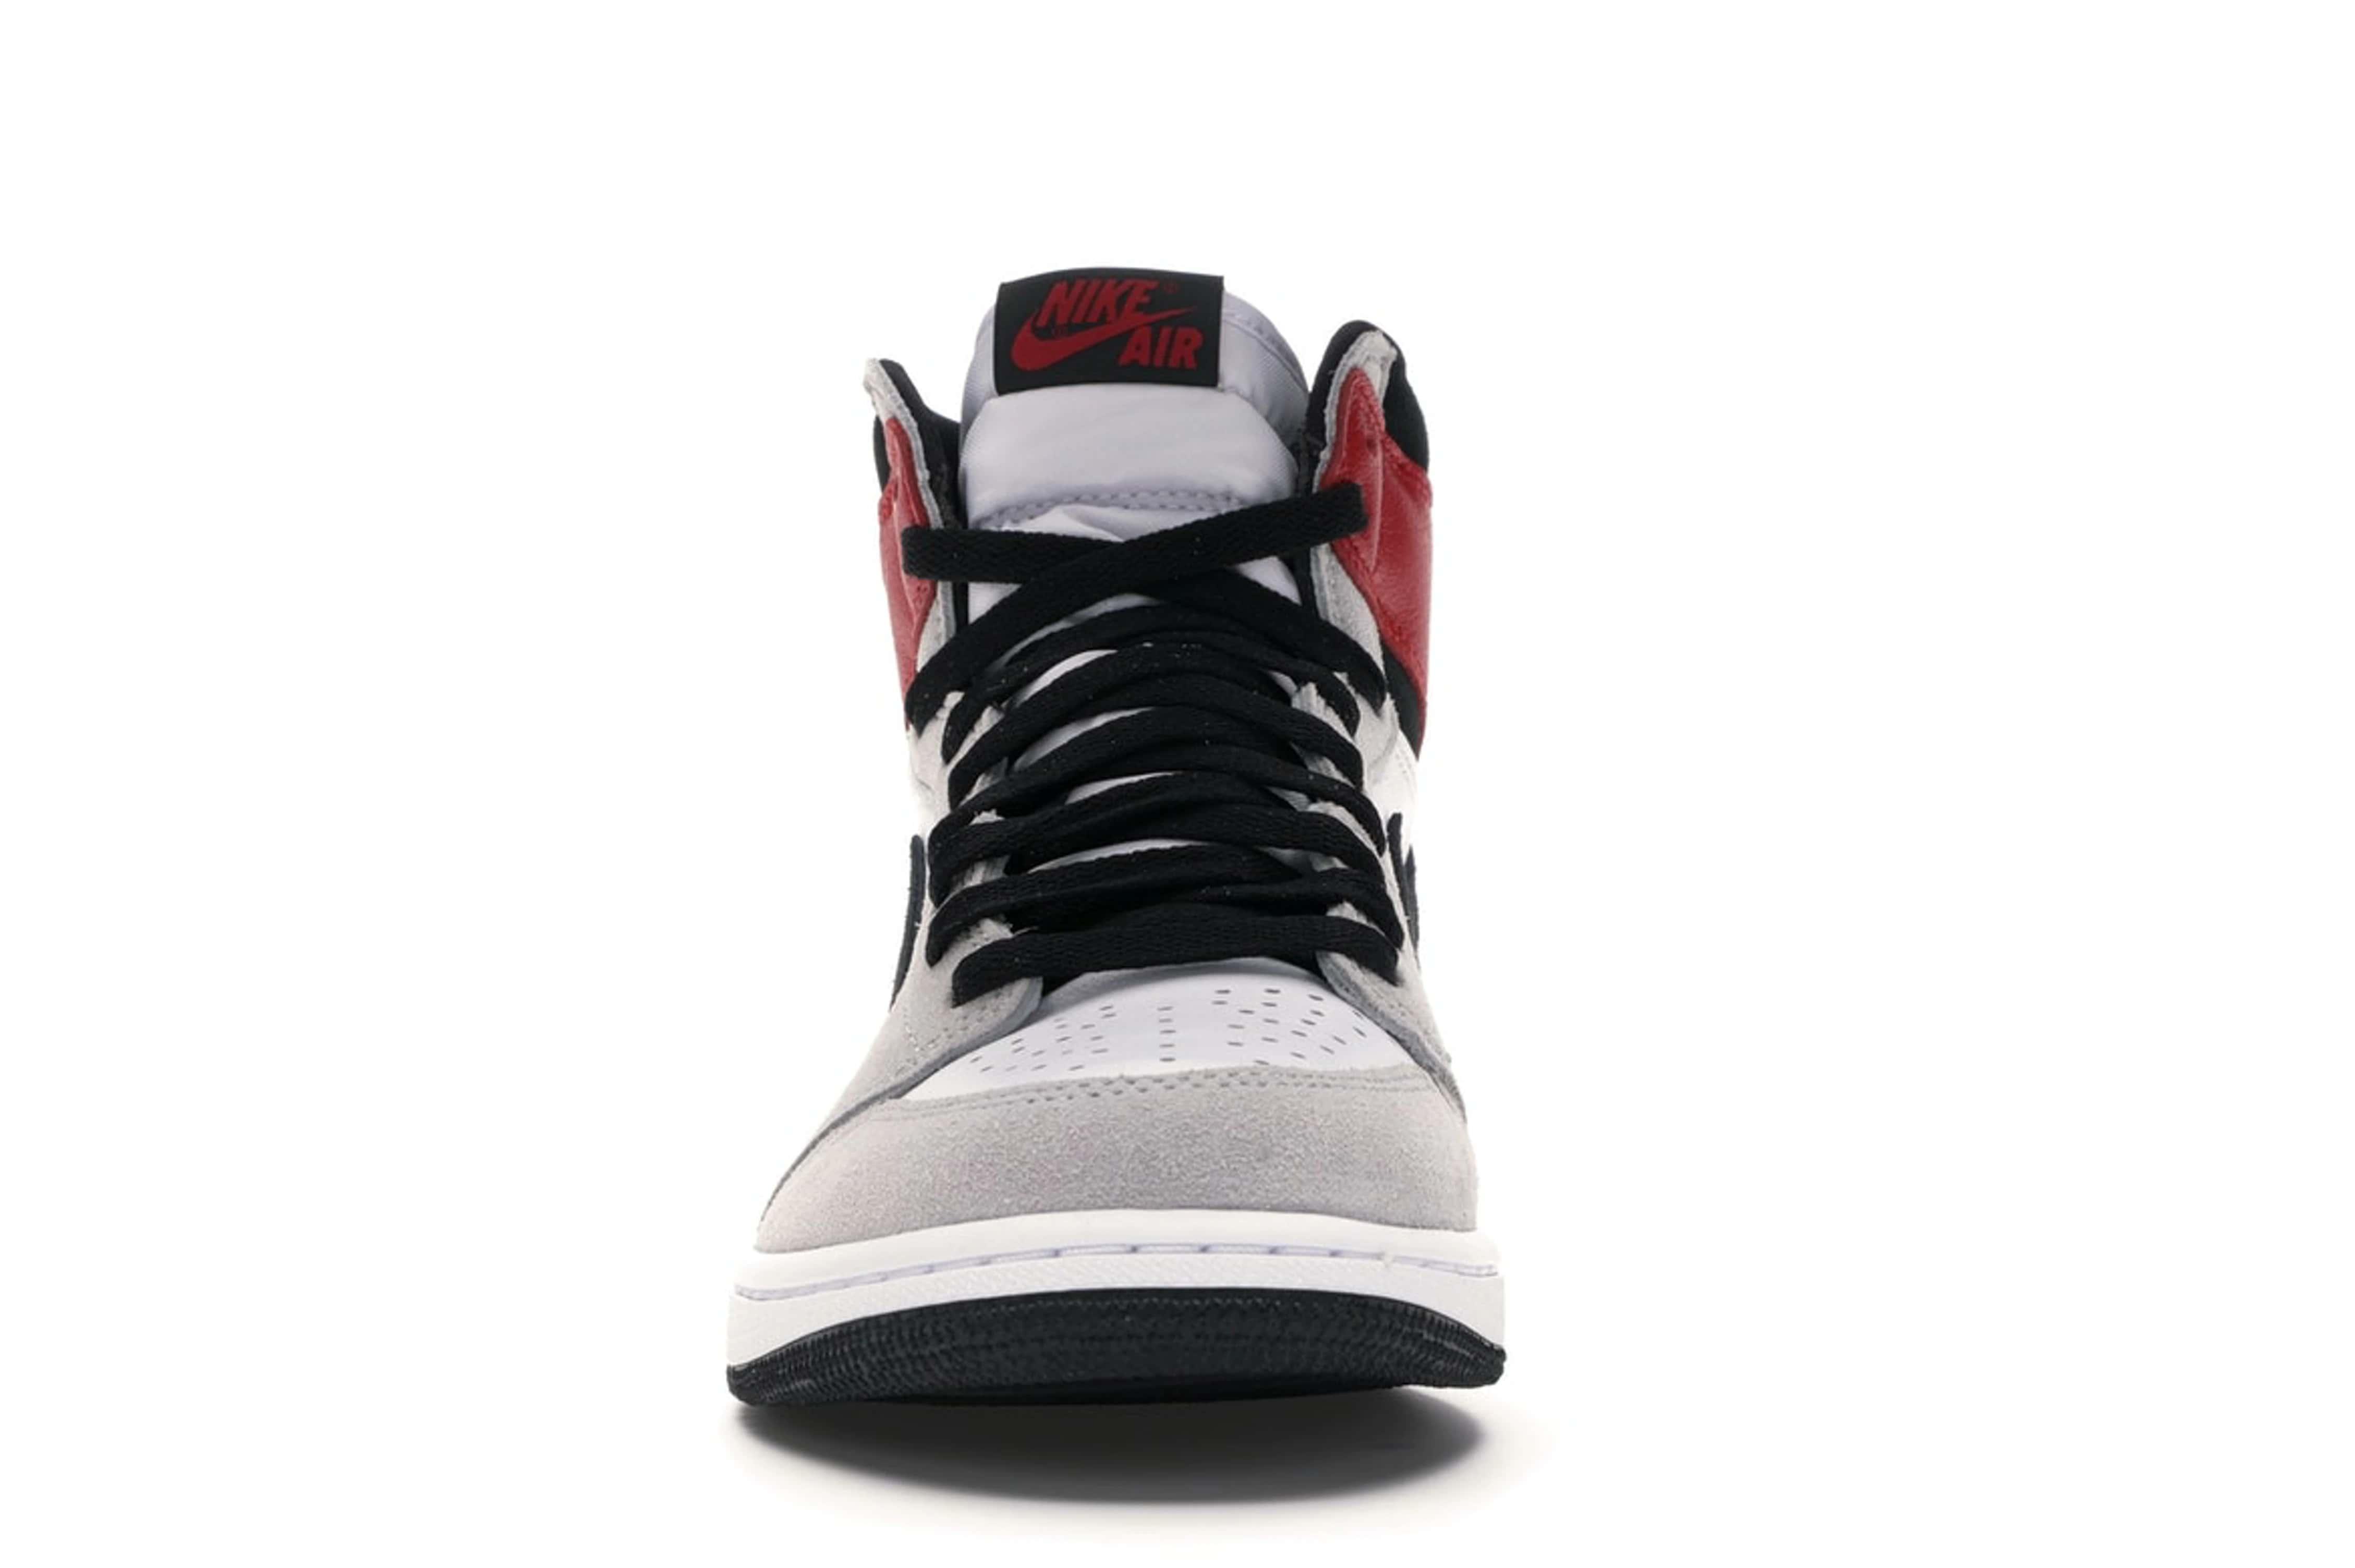 slide 2 - Jordan 1 Retro High Light Smoke Grey